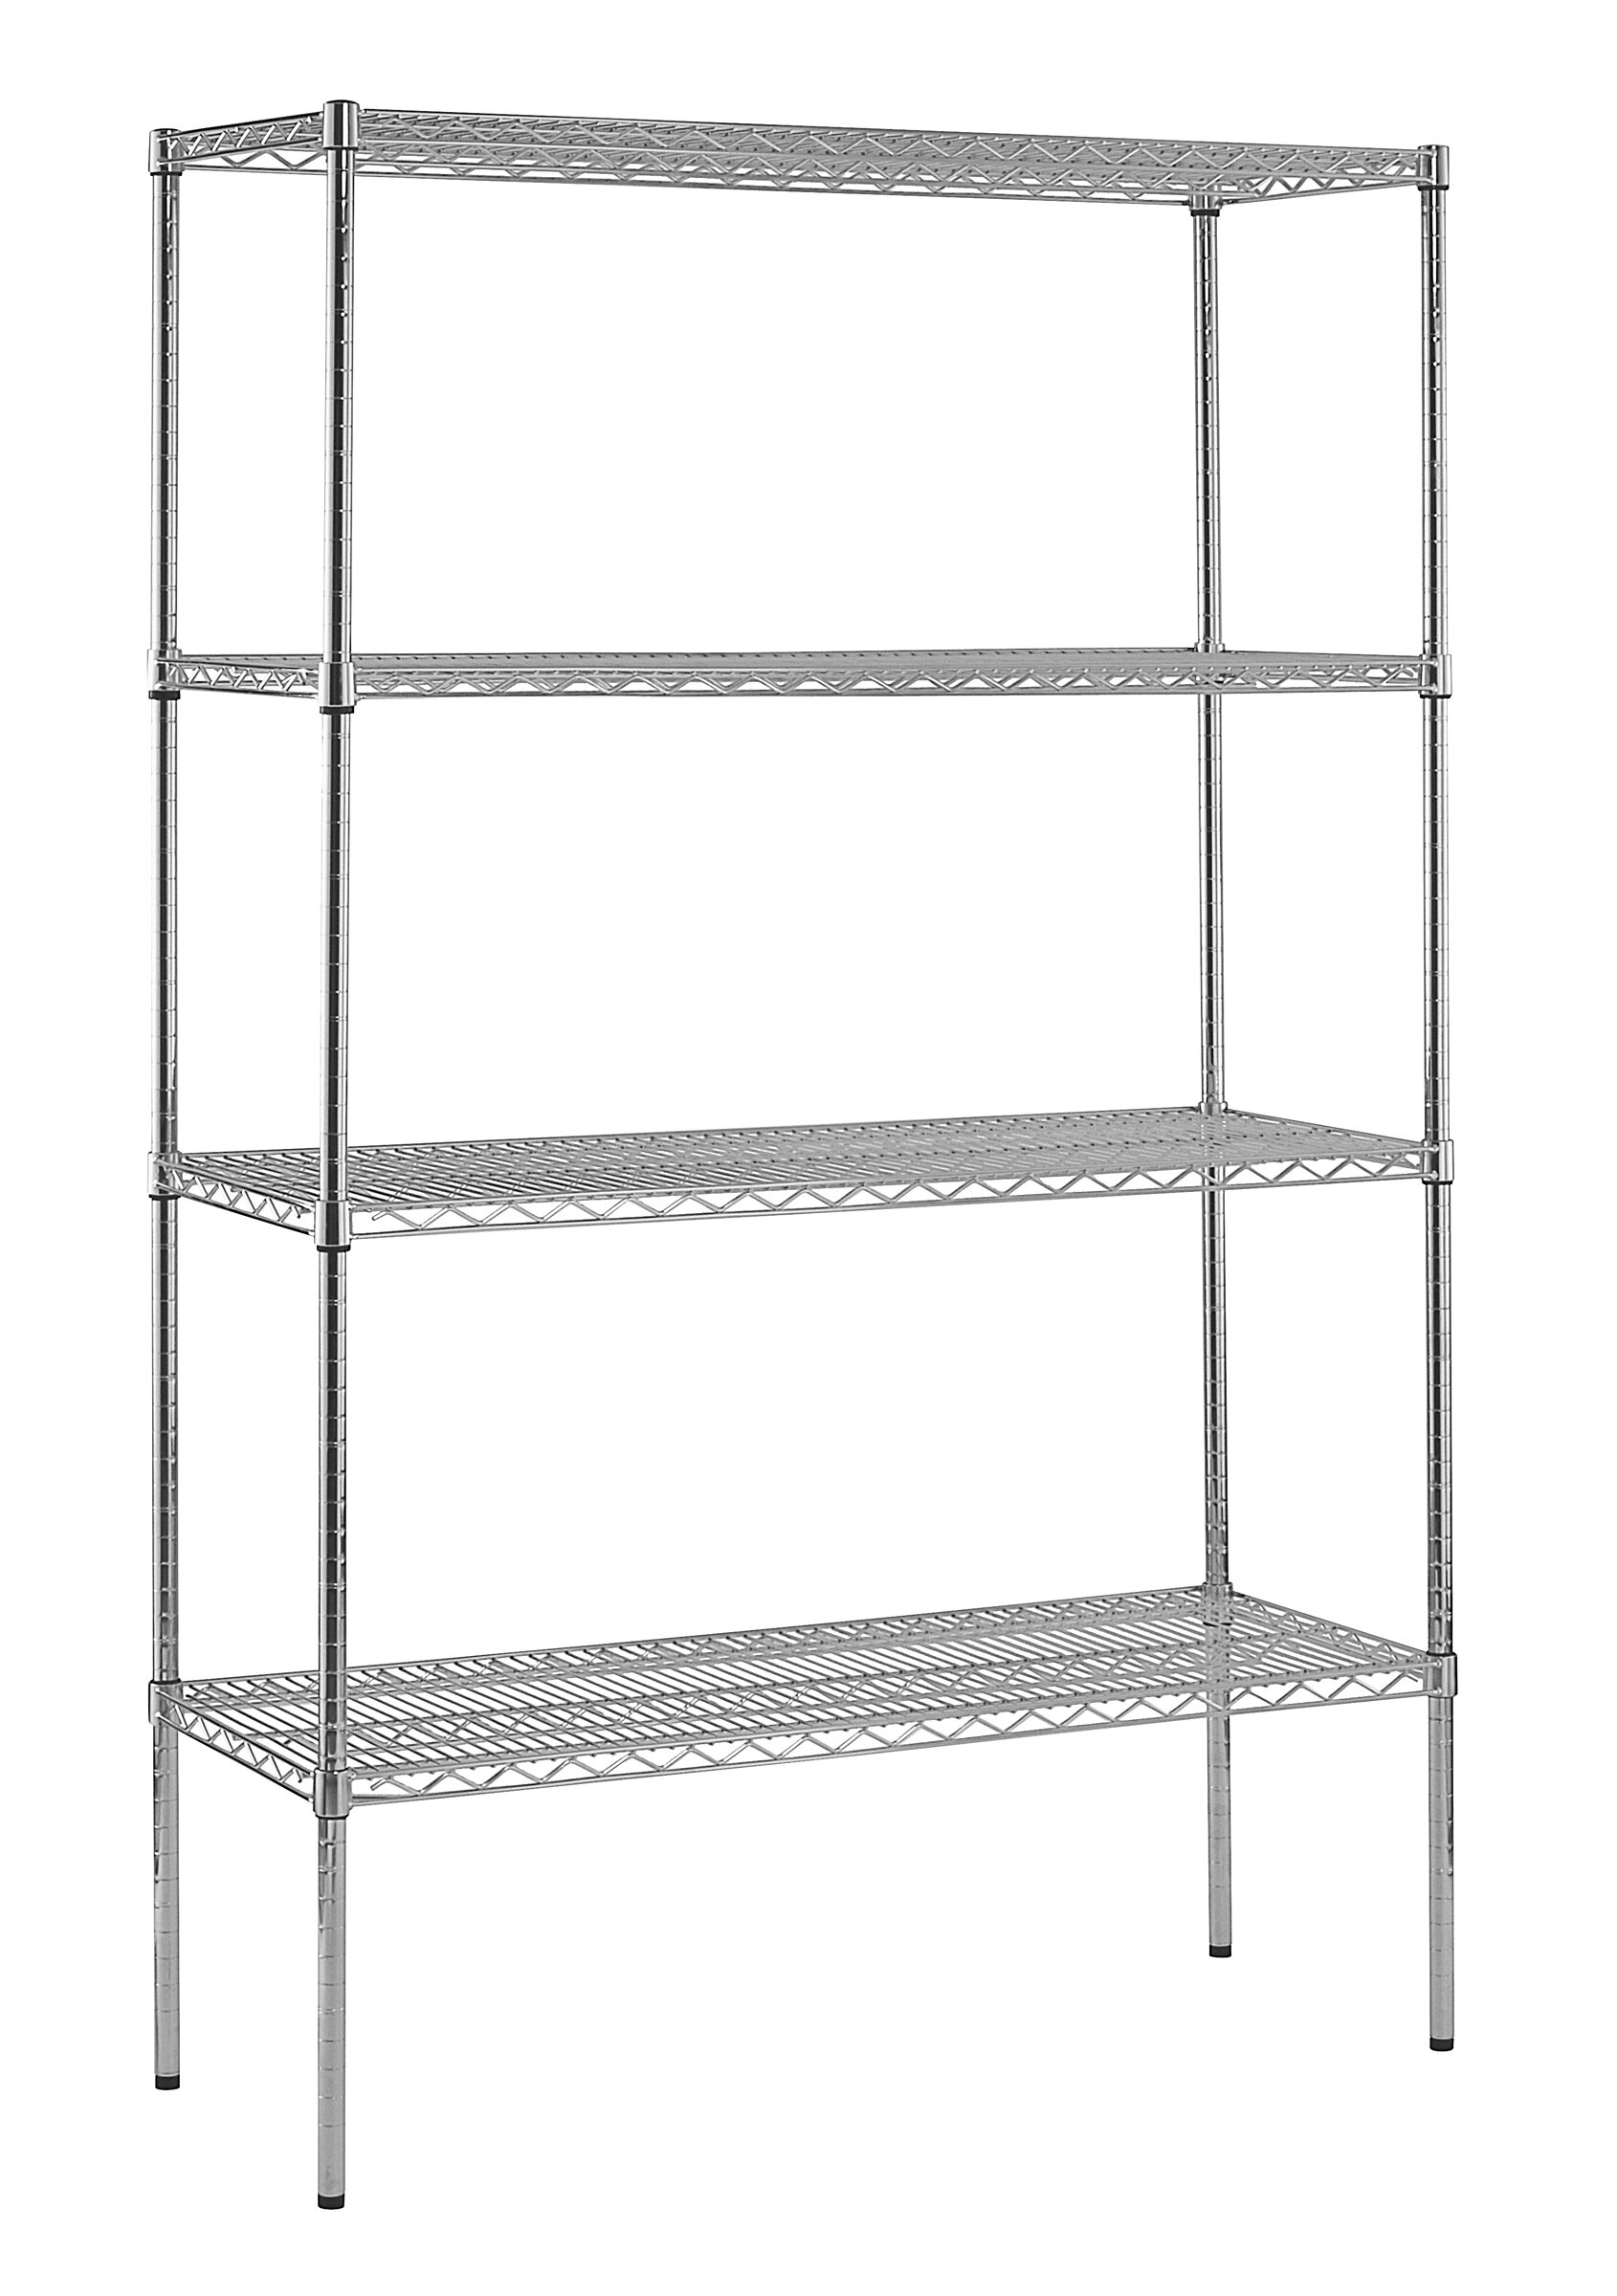 Sandusky Heavy Duty Shelf Wire Shelving Unit & Reviews | Wayfair